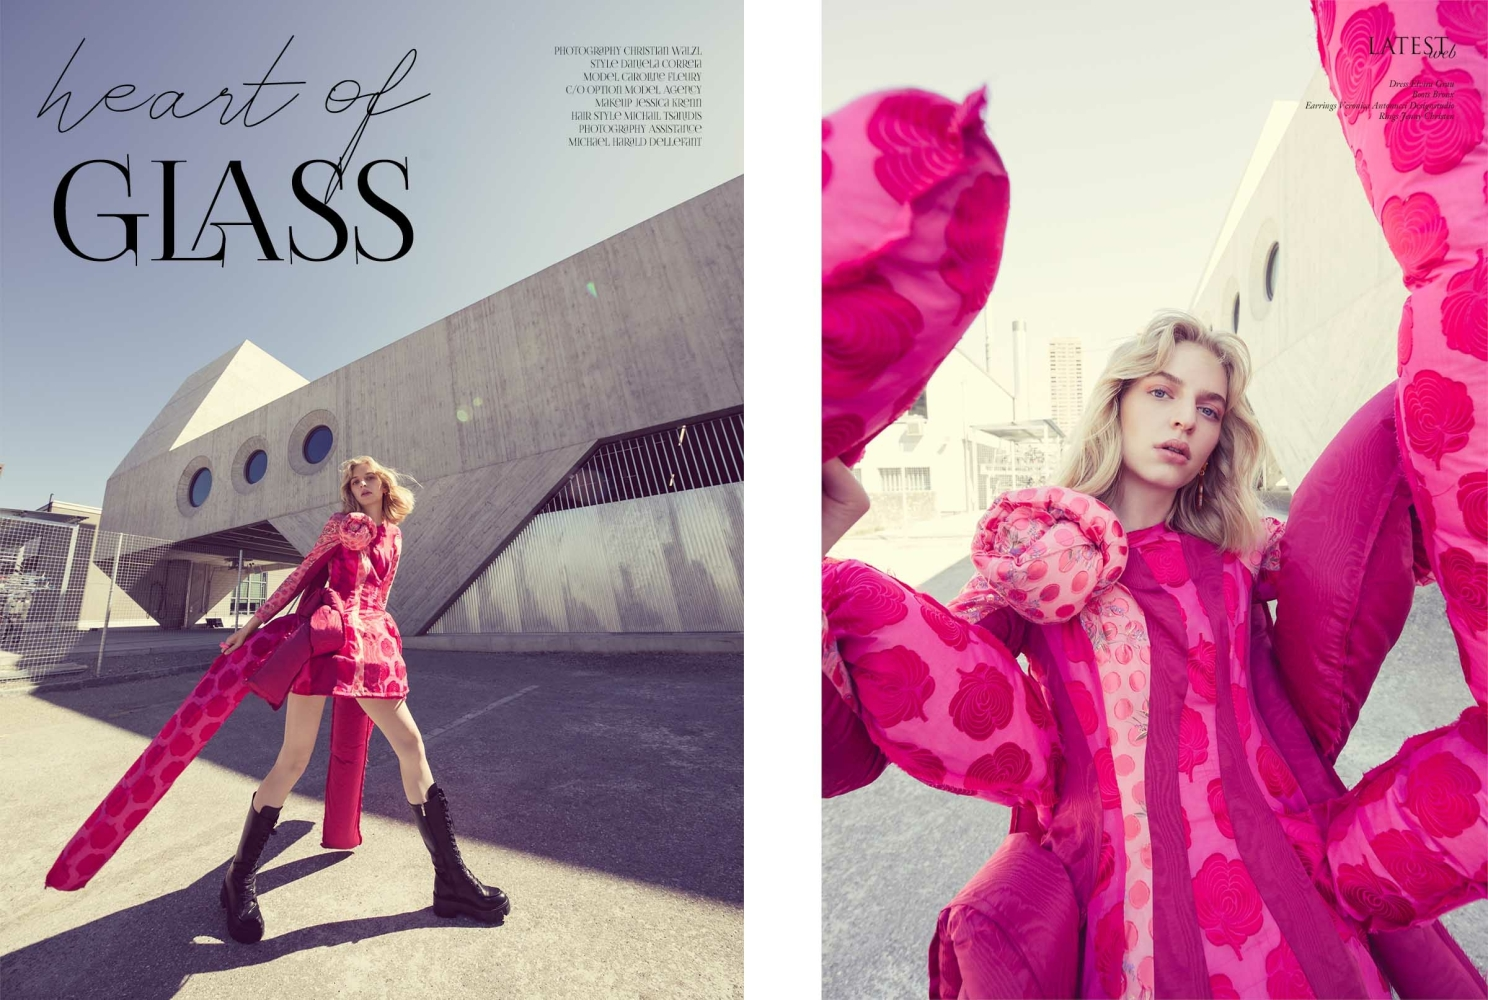 CAROLINE F for LATEST magazine HEART OF GLASS